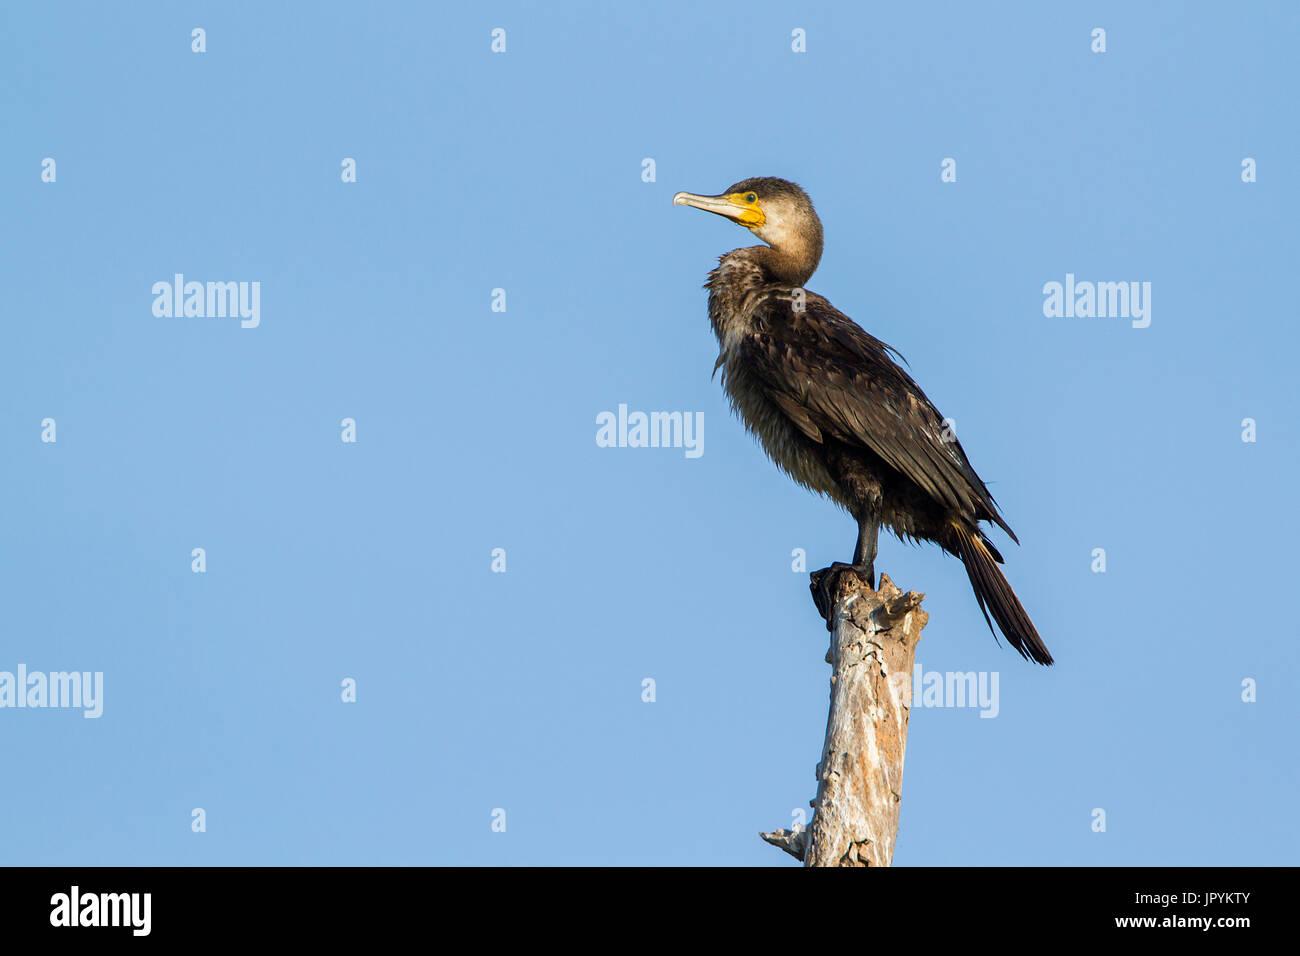 Great cormorant on stake - Arugam Bay lagoon Sri Lanka - Stock Image